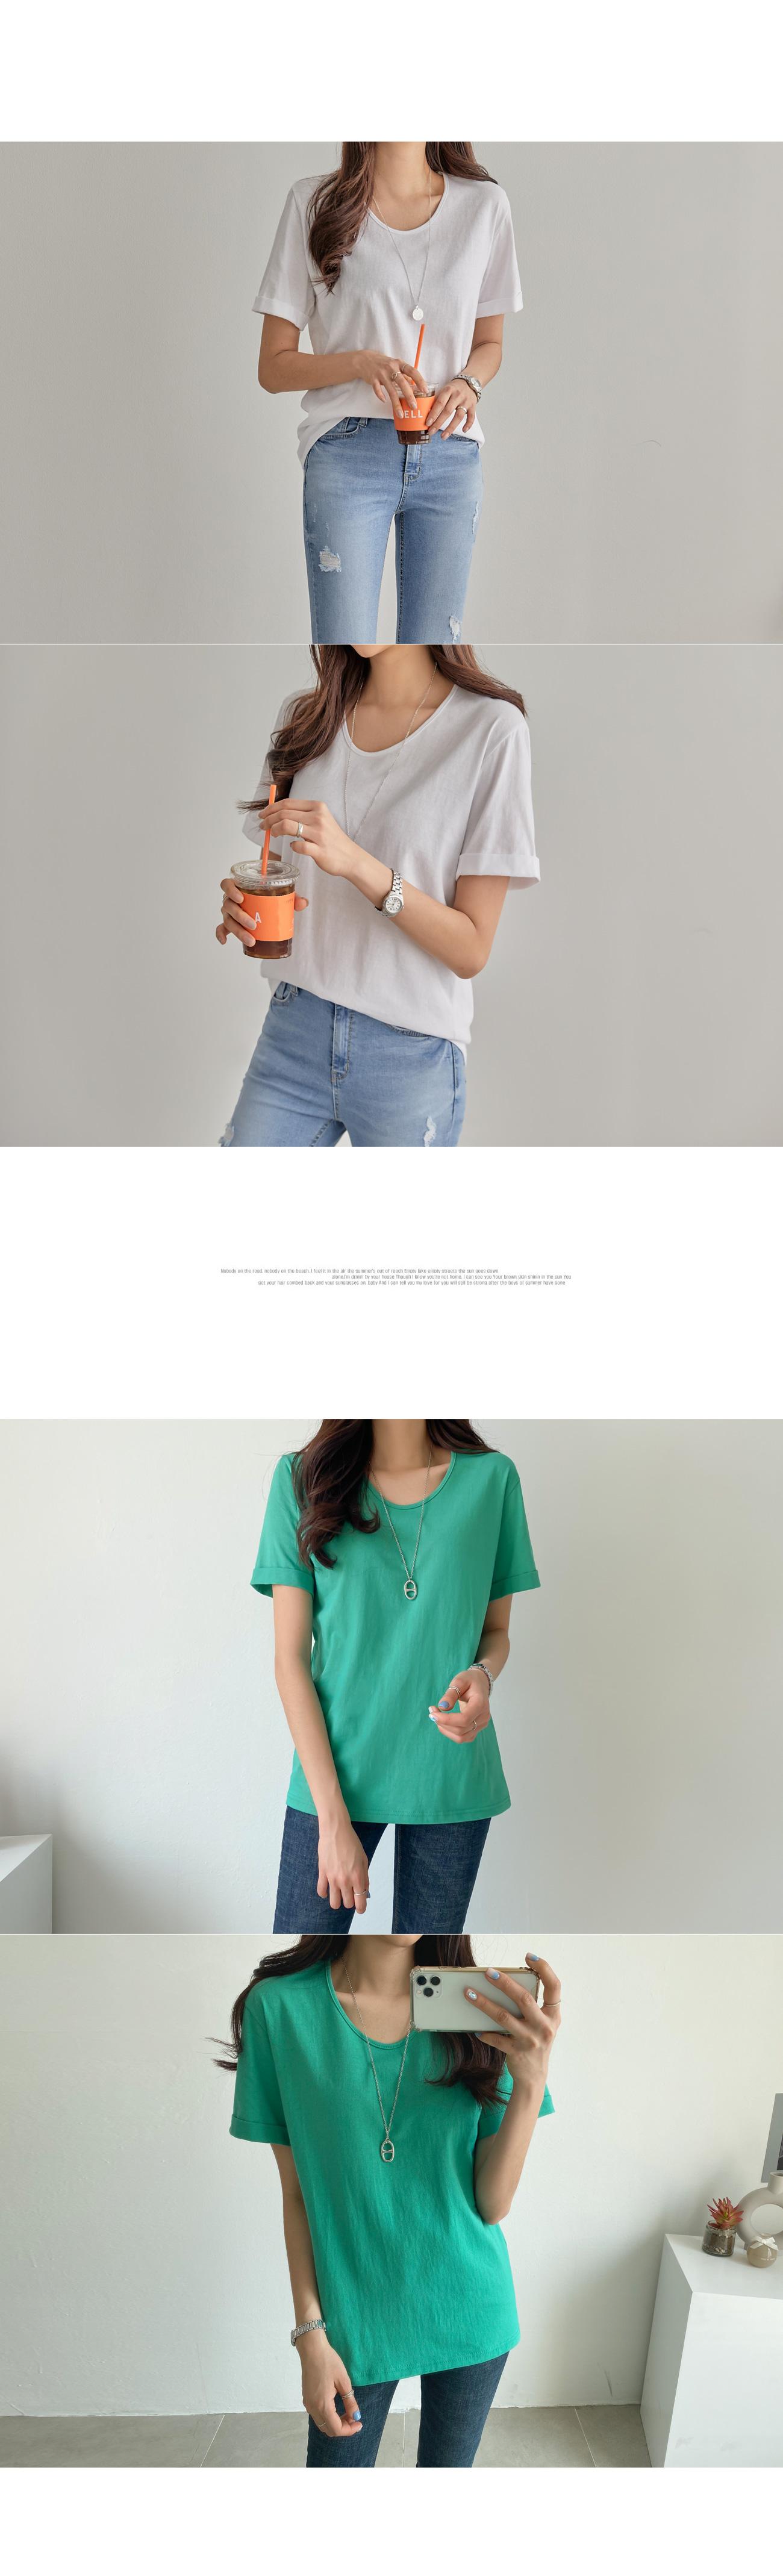 Basic Rolling T-shirt #105776